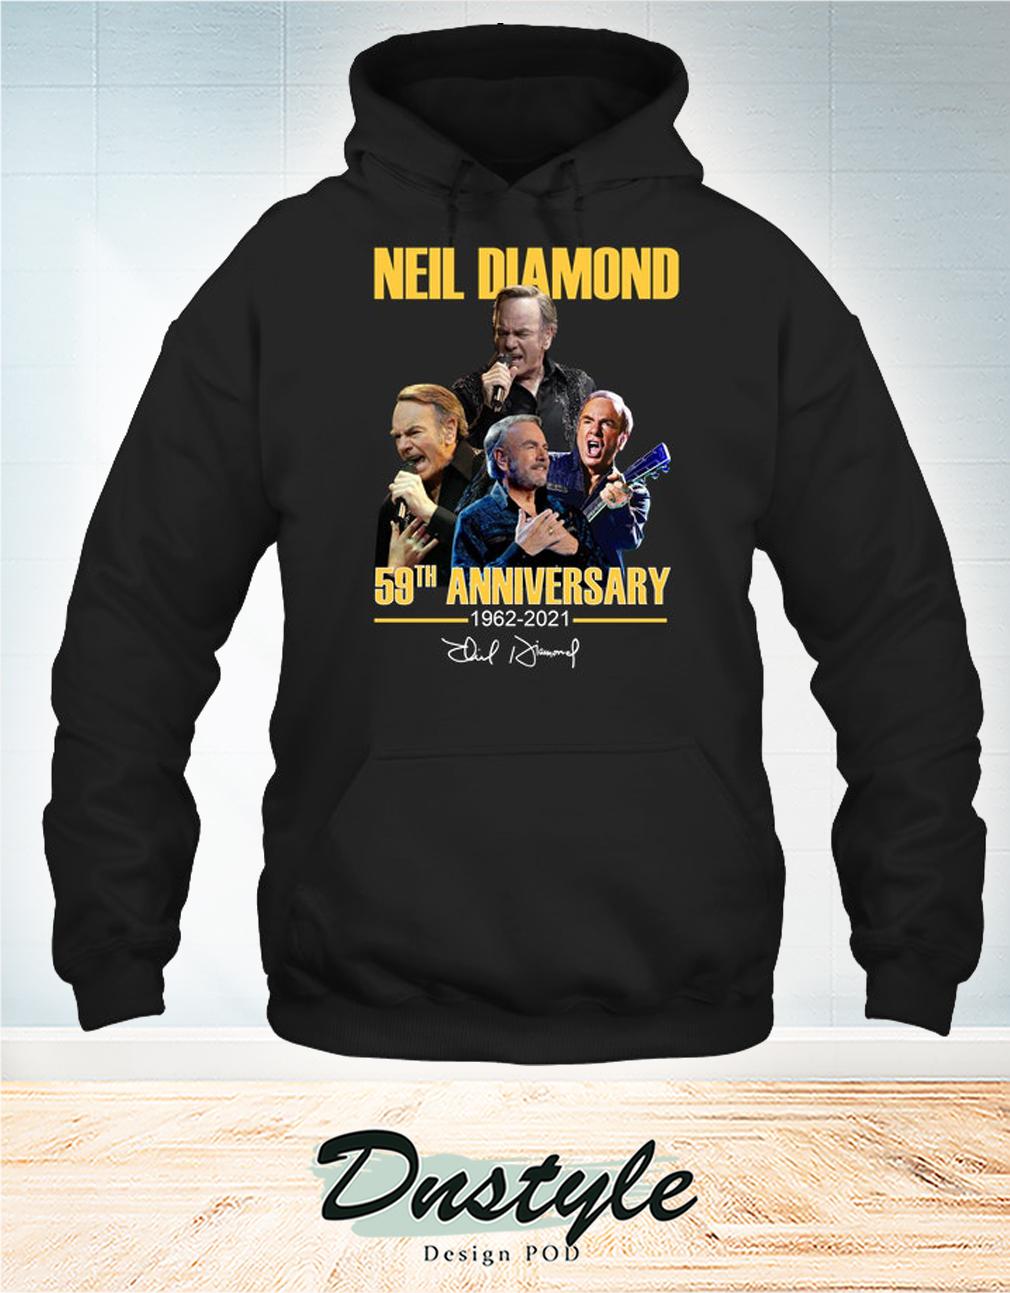 Neil Diamond 59th anniversary 1962 2021 signature hoodie